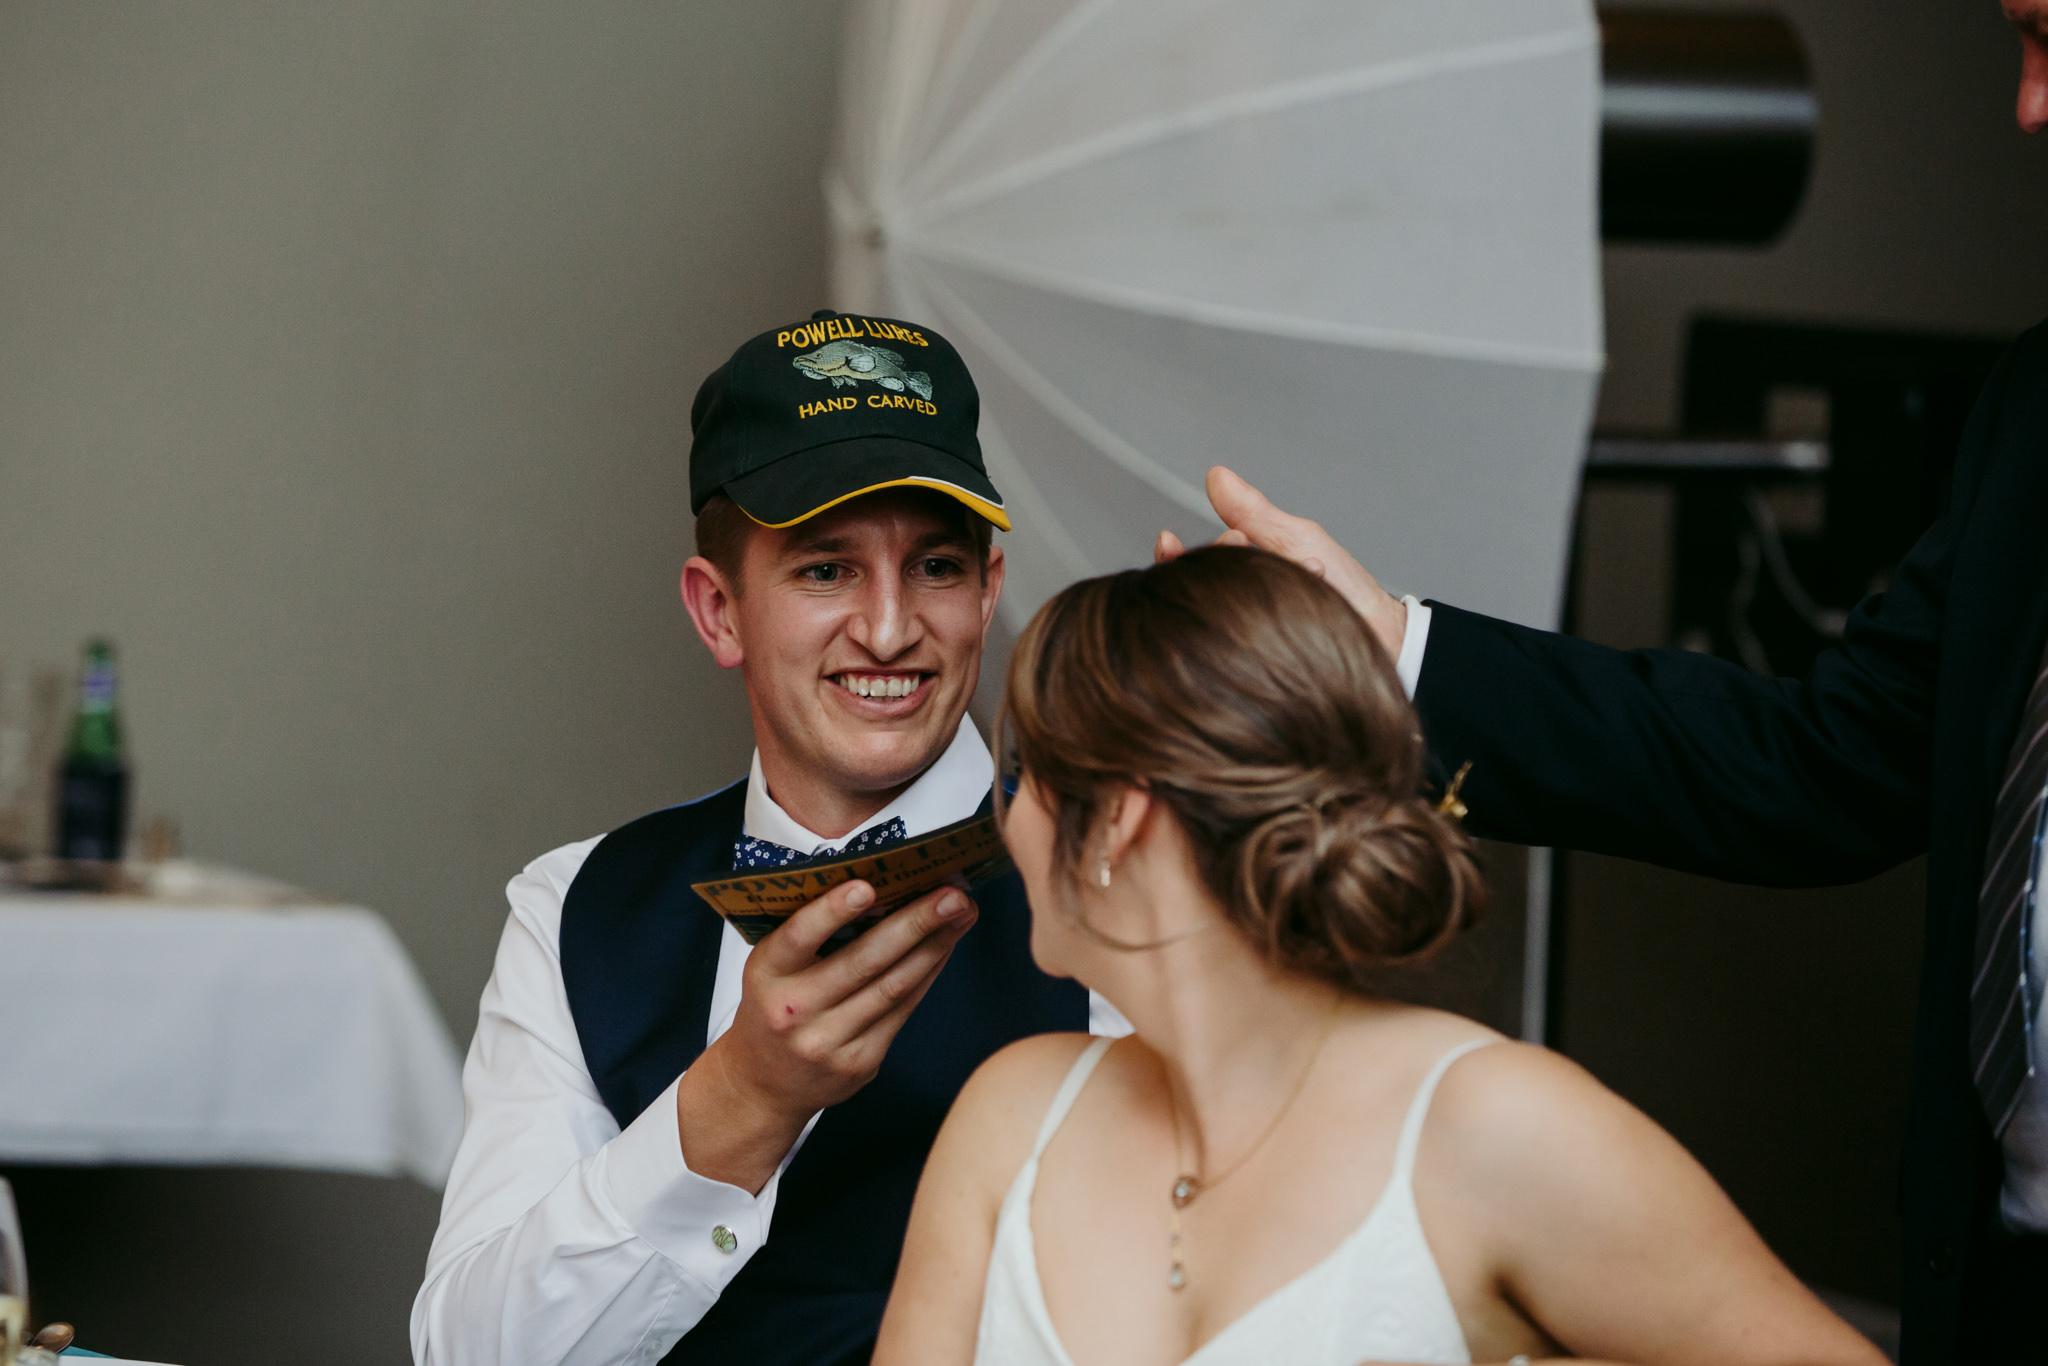 Erin Latimore Mudgee Canberra Wedding Photographer ROSEBANK GUESTHOUSE OLD THEATRE TONIC MILLTHORPE_759.JPG